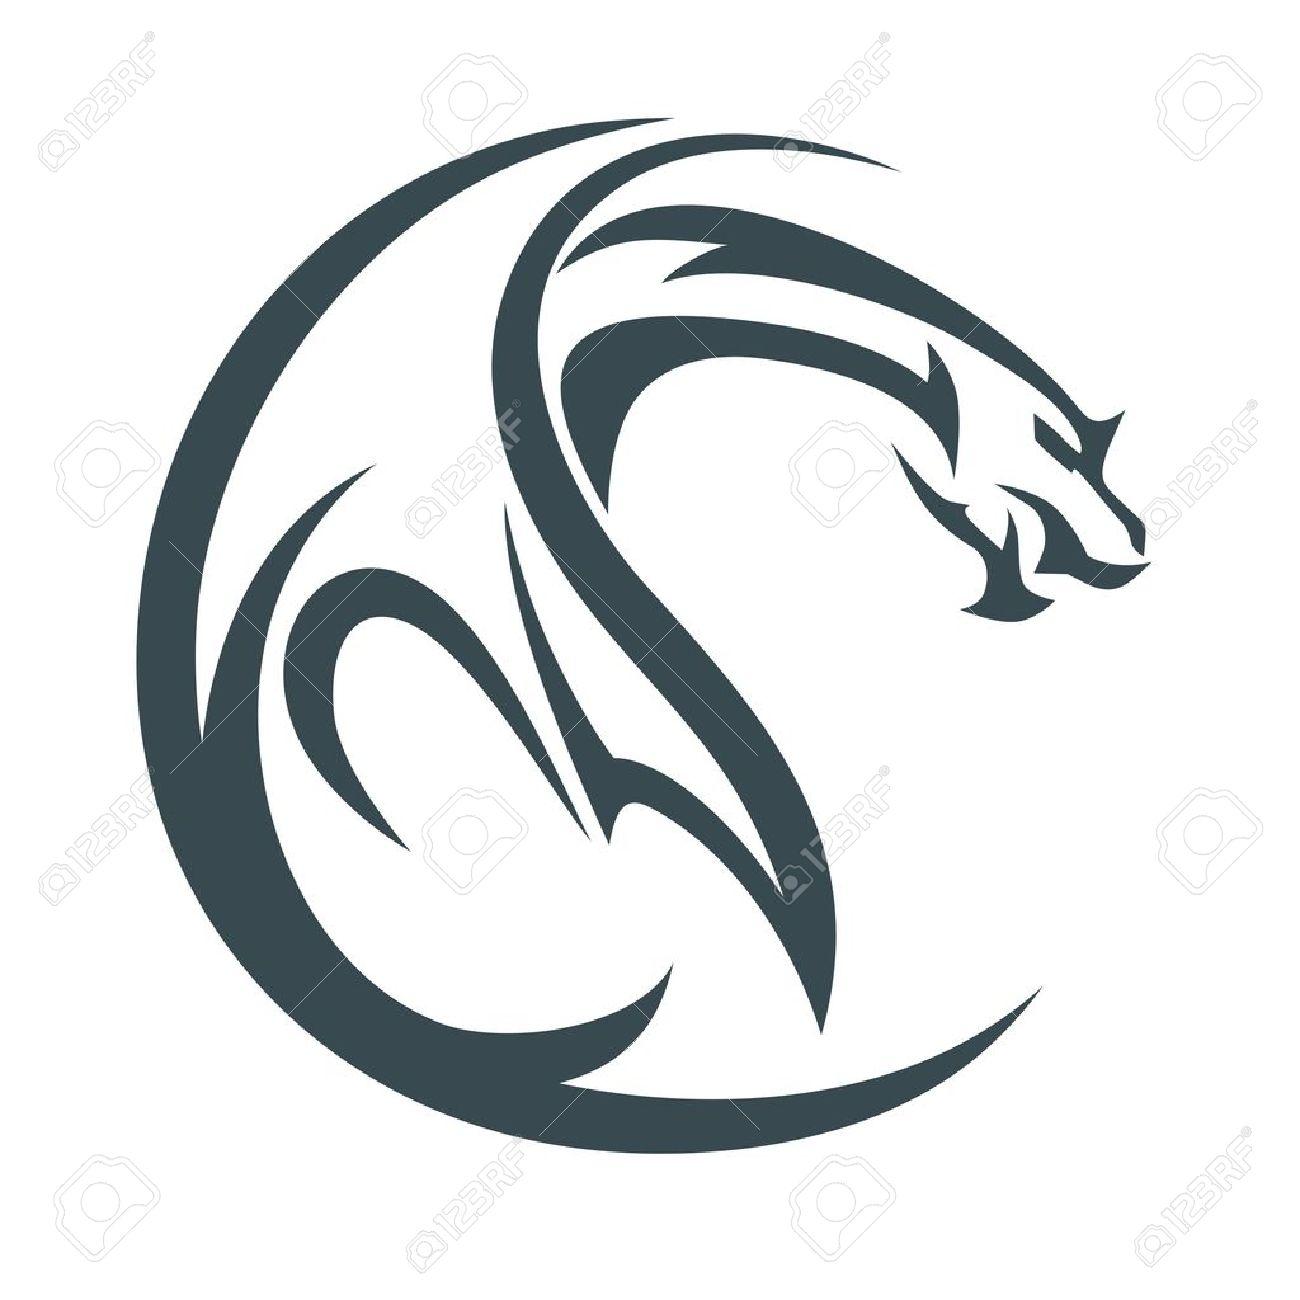 dragon logo vector free alternative clipart design